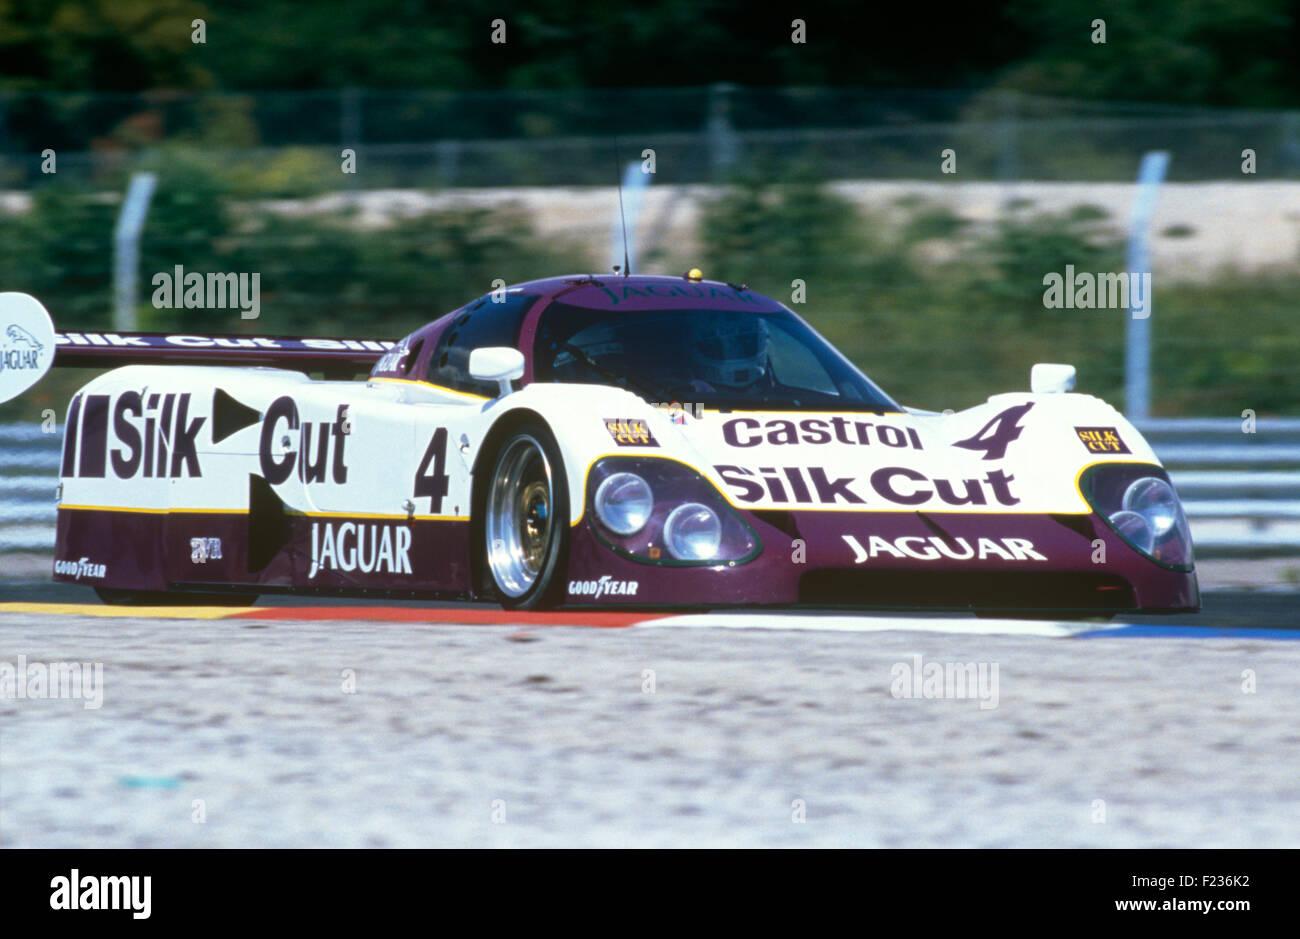 Davy Jones, Michel Fert and Eliseo Salazar Jaguar XJR Le Mans 16 June 1990 - Stock Image